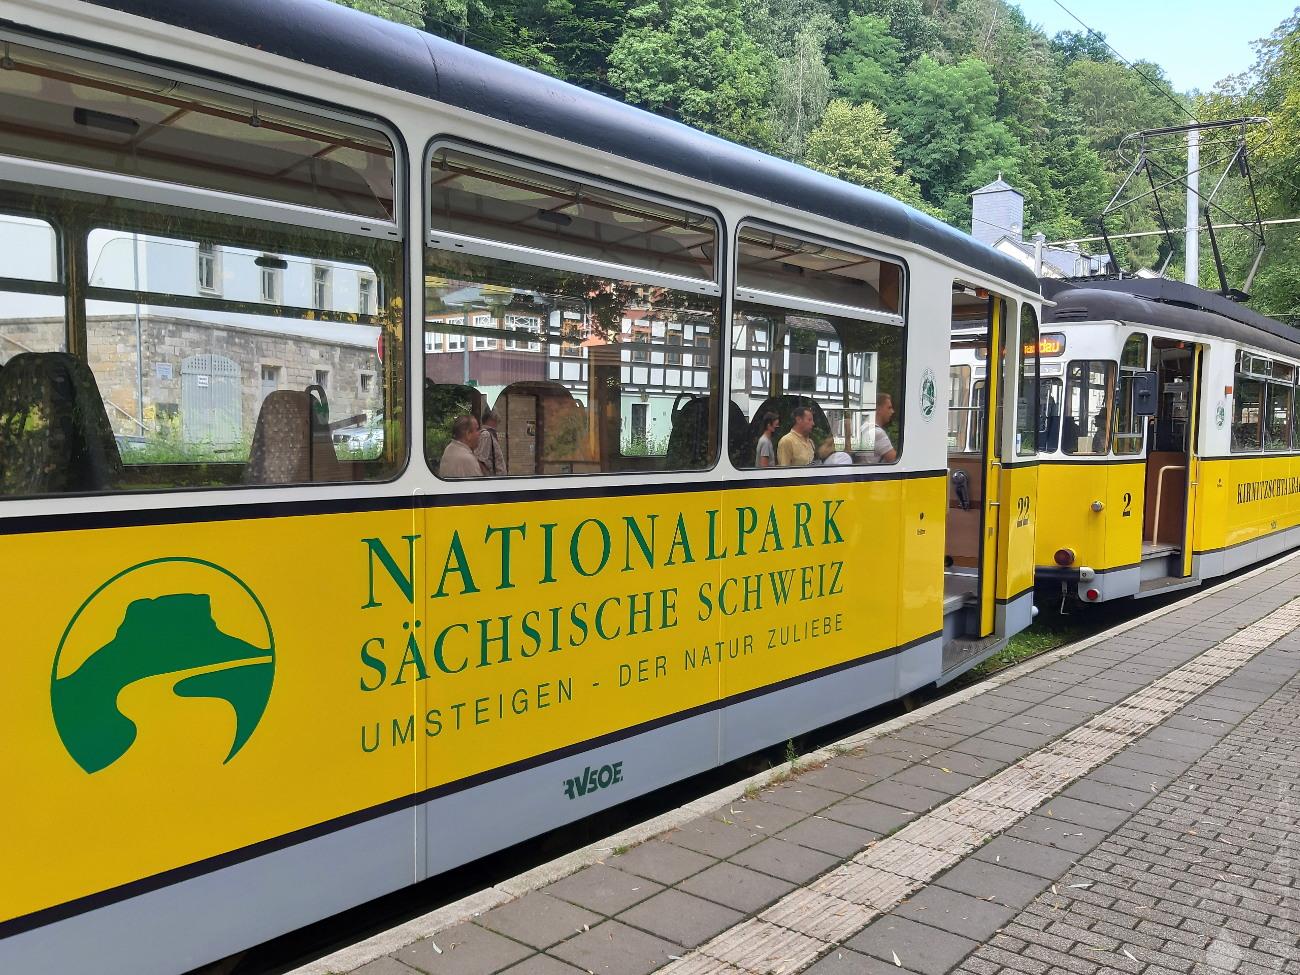 #Kirnitzschtalbahn Bad Schandau